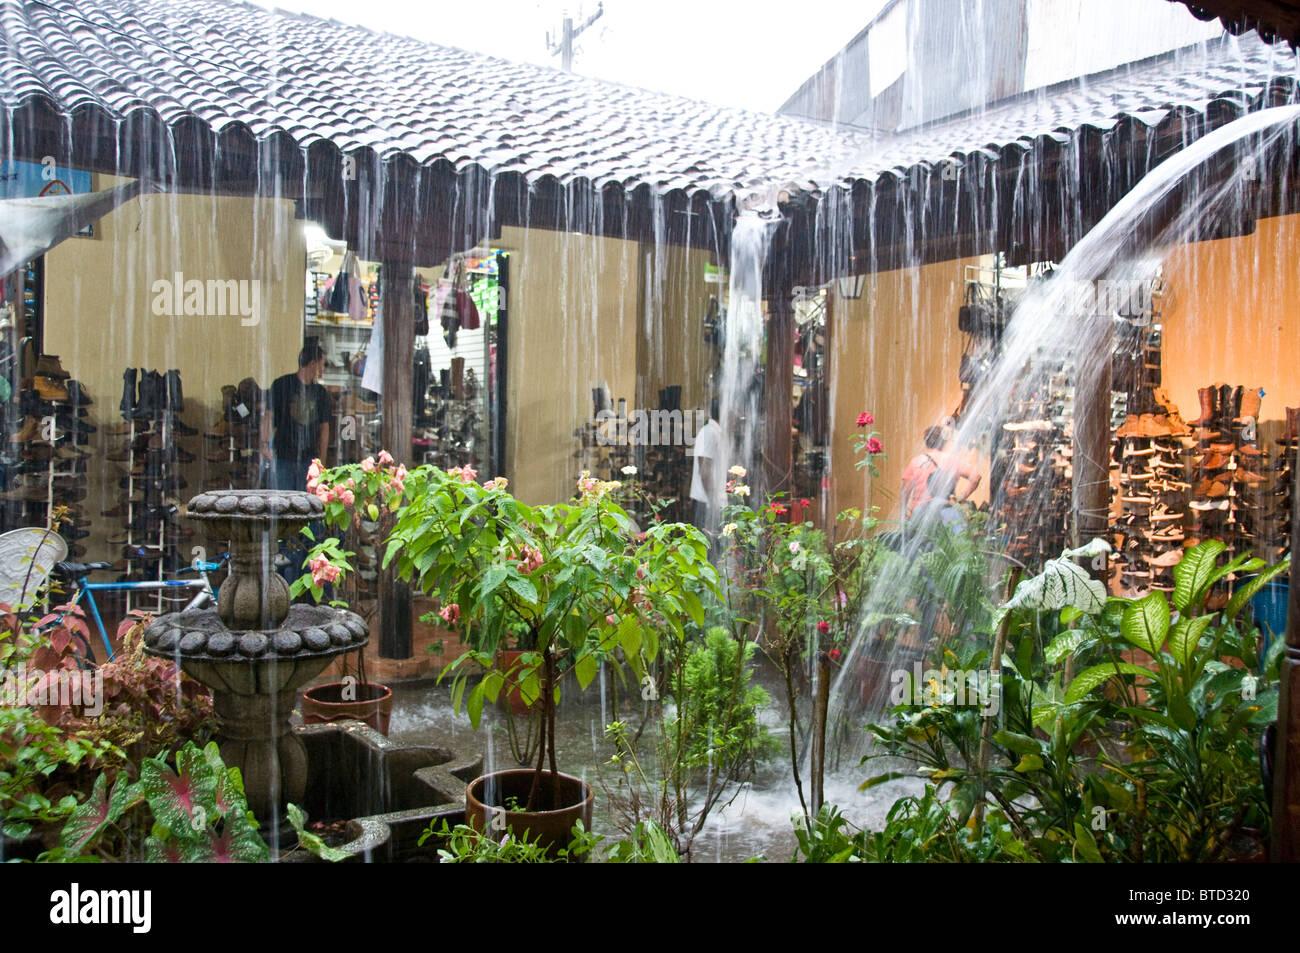 Heavy rains Leon Nicaragua - Stock Image